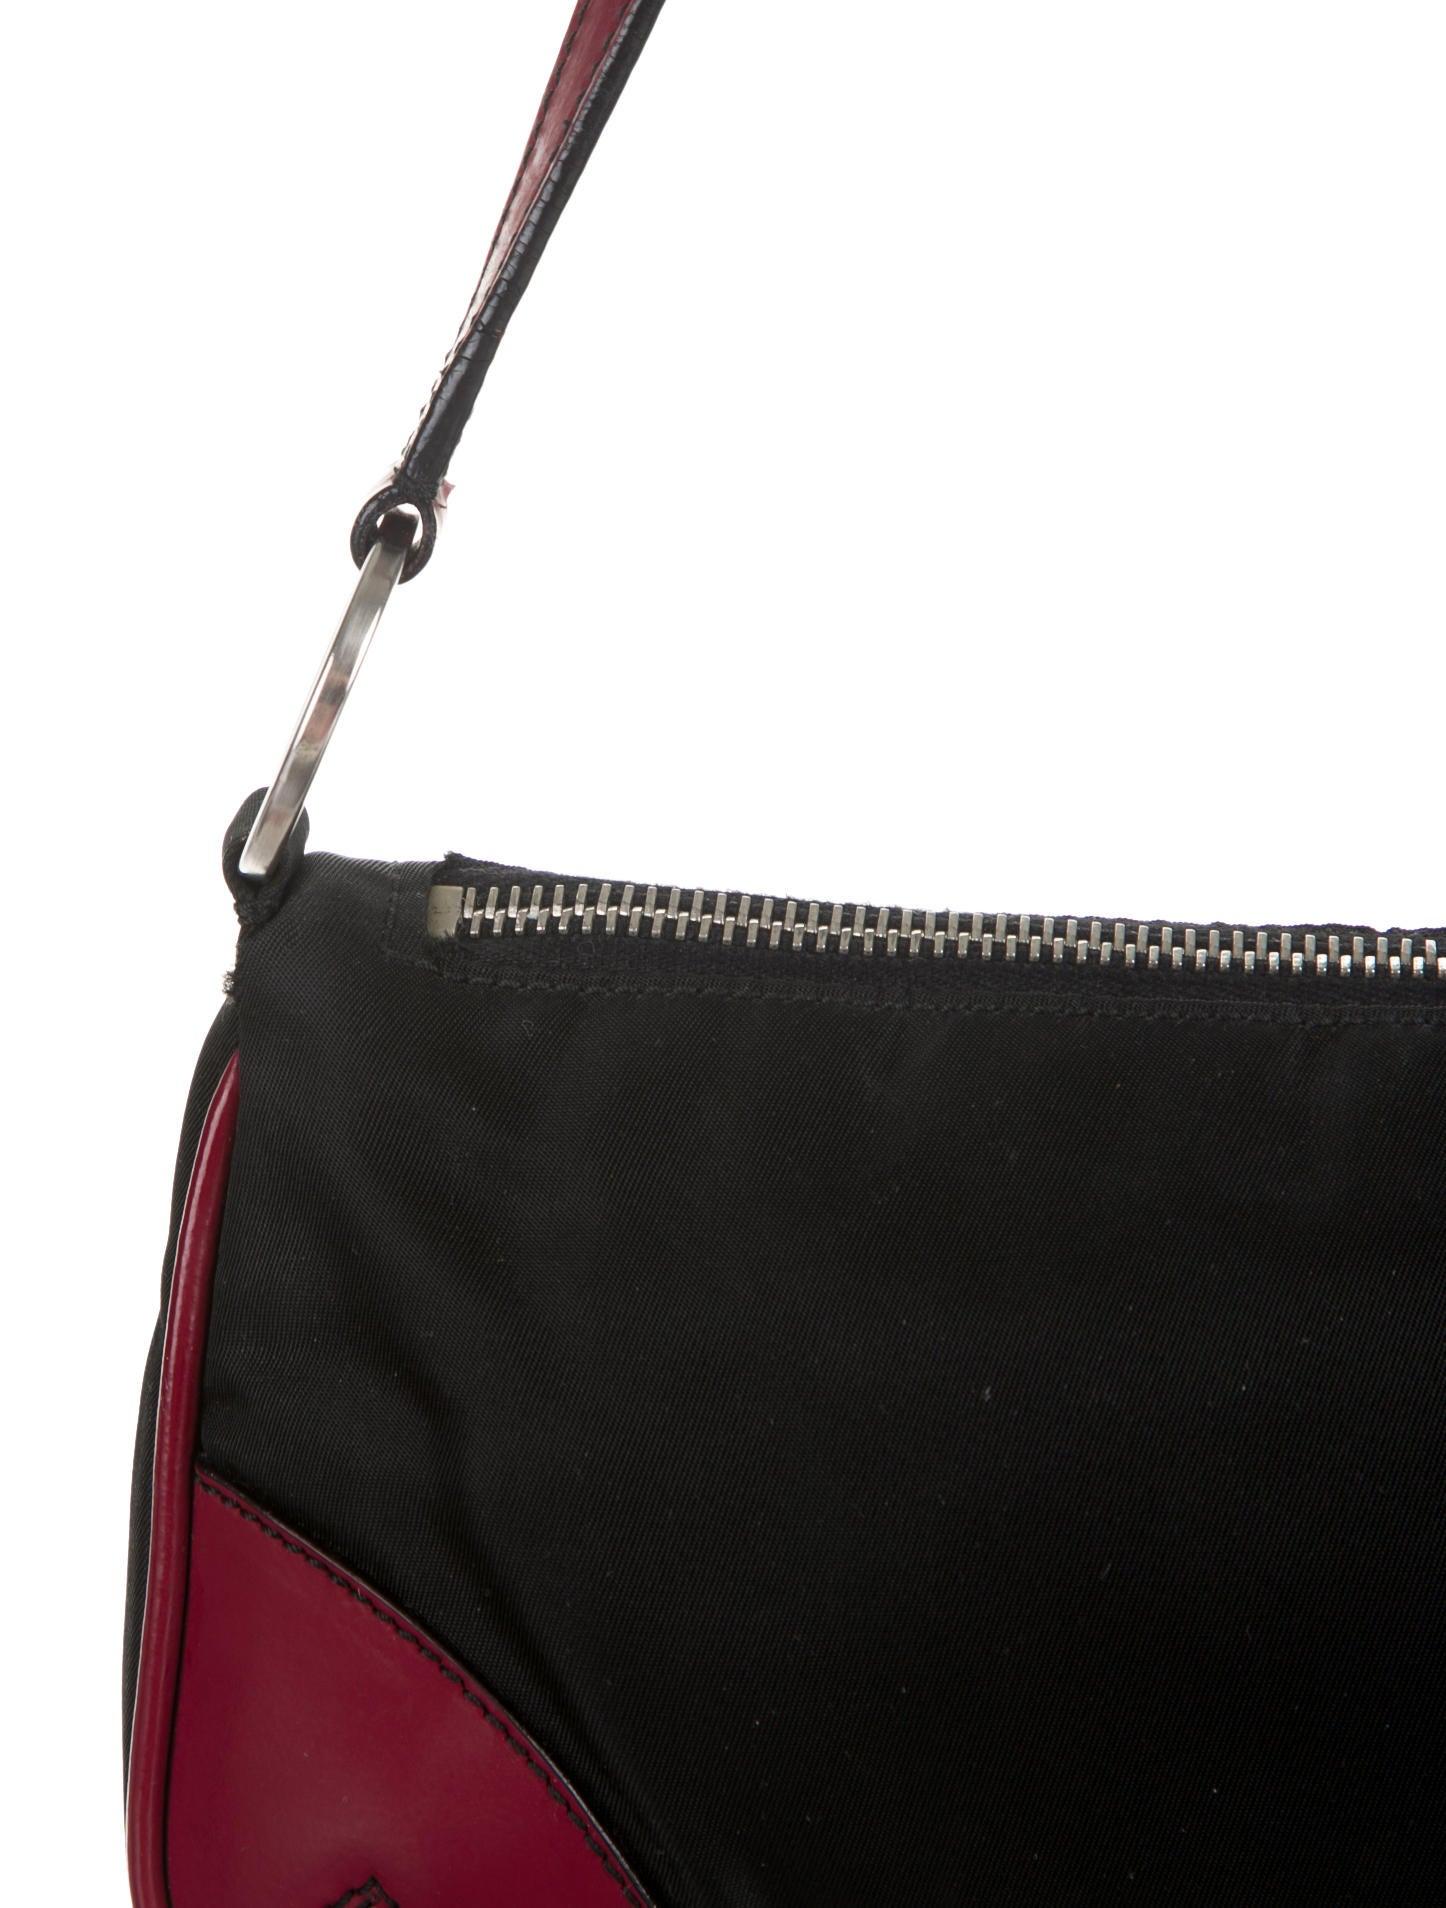 ... closeout prada tessuto sport handle bag fake handbags thailand 2016 11  10 15282 728b6 e4cb3 6d1bd57decb67